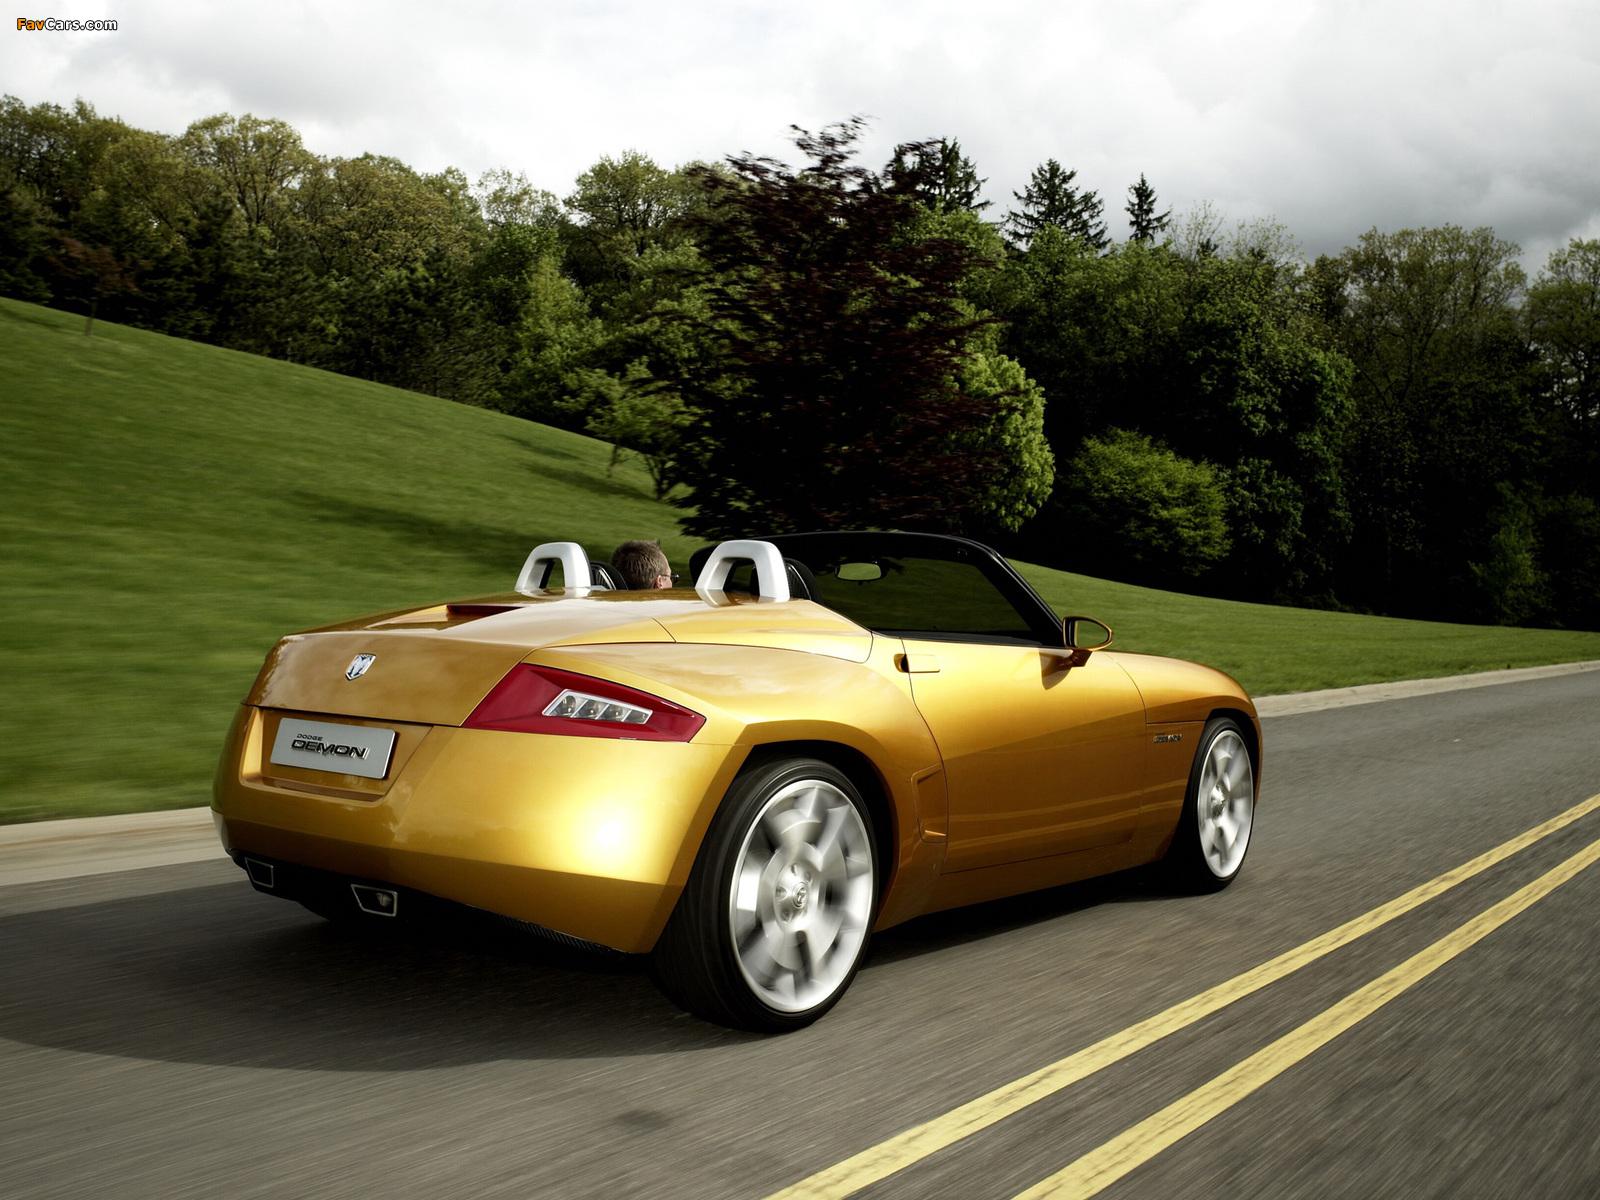 Dodge Demon Roadster Concept 2007 pictures (1600 x 1200)